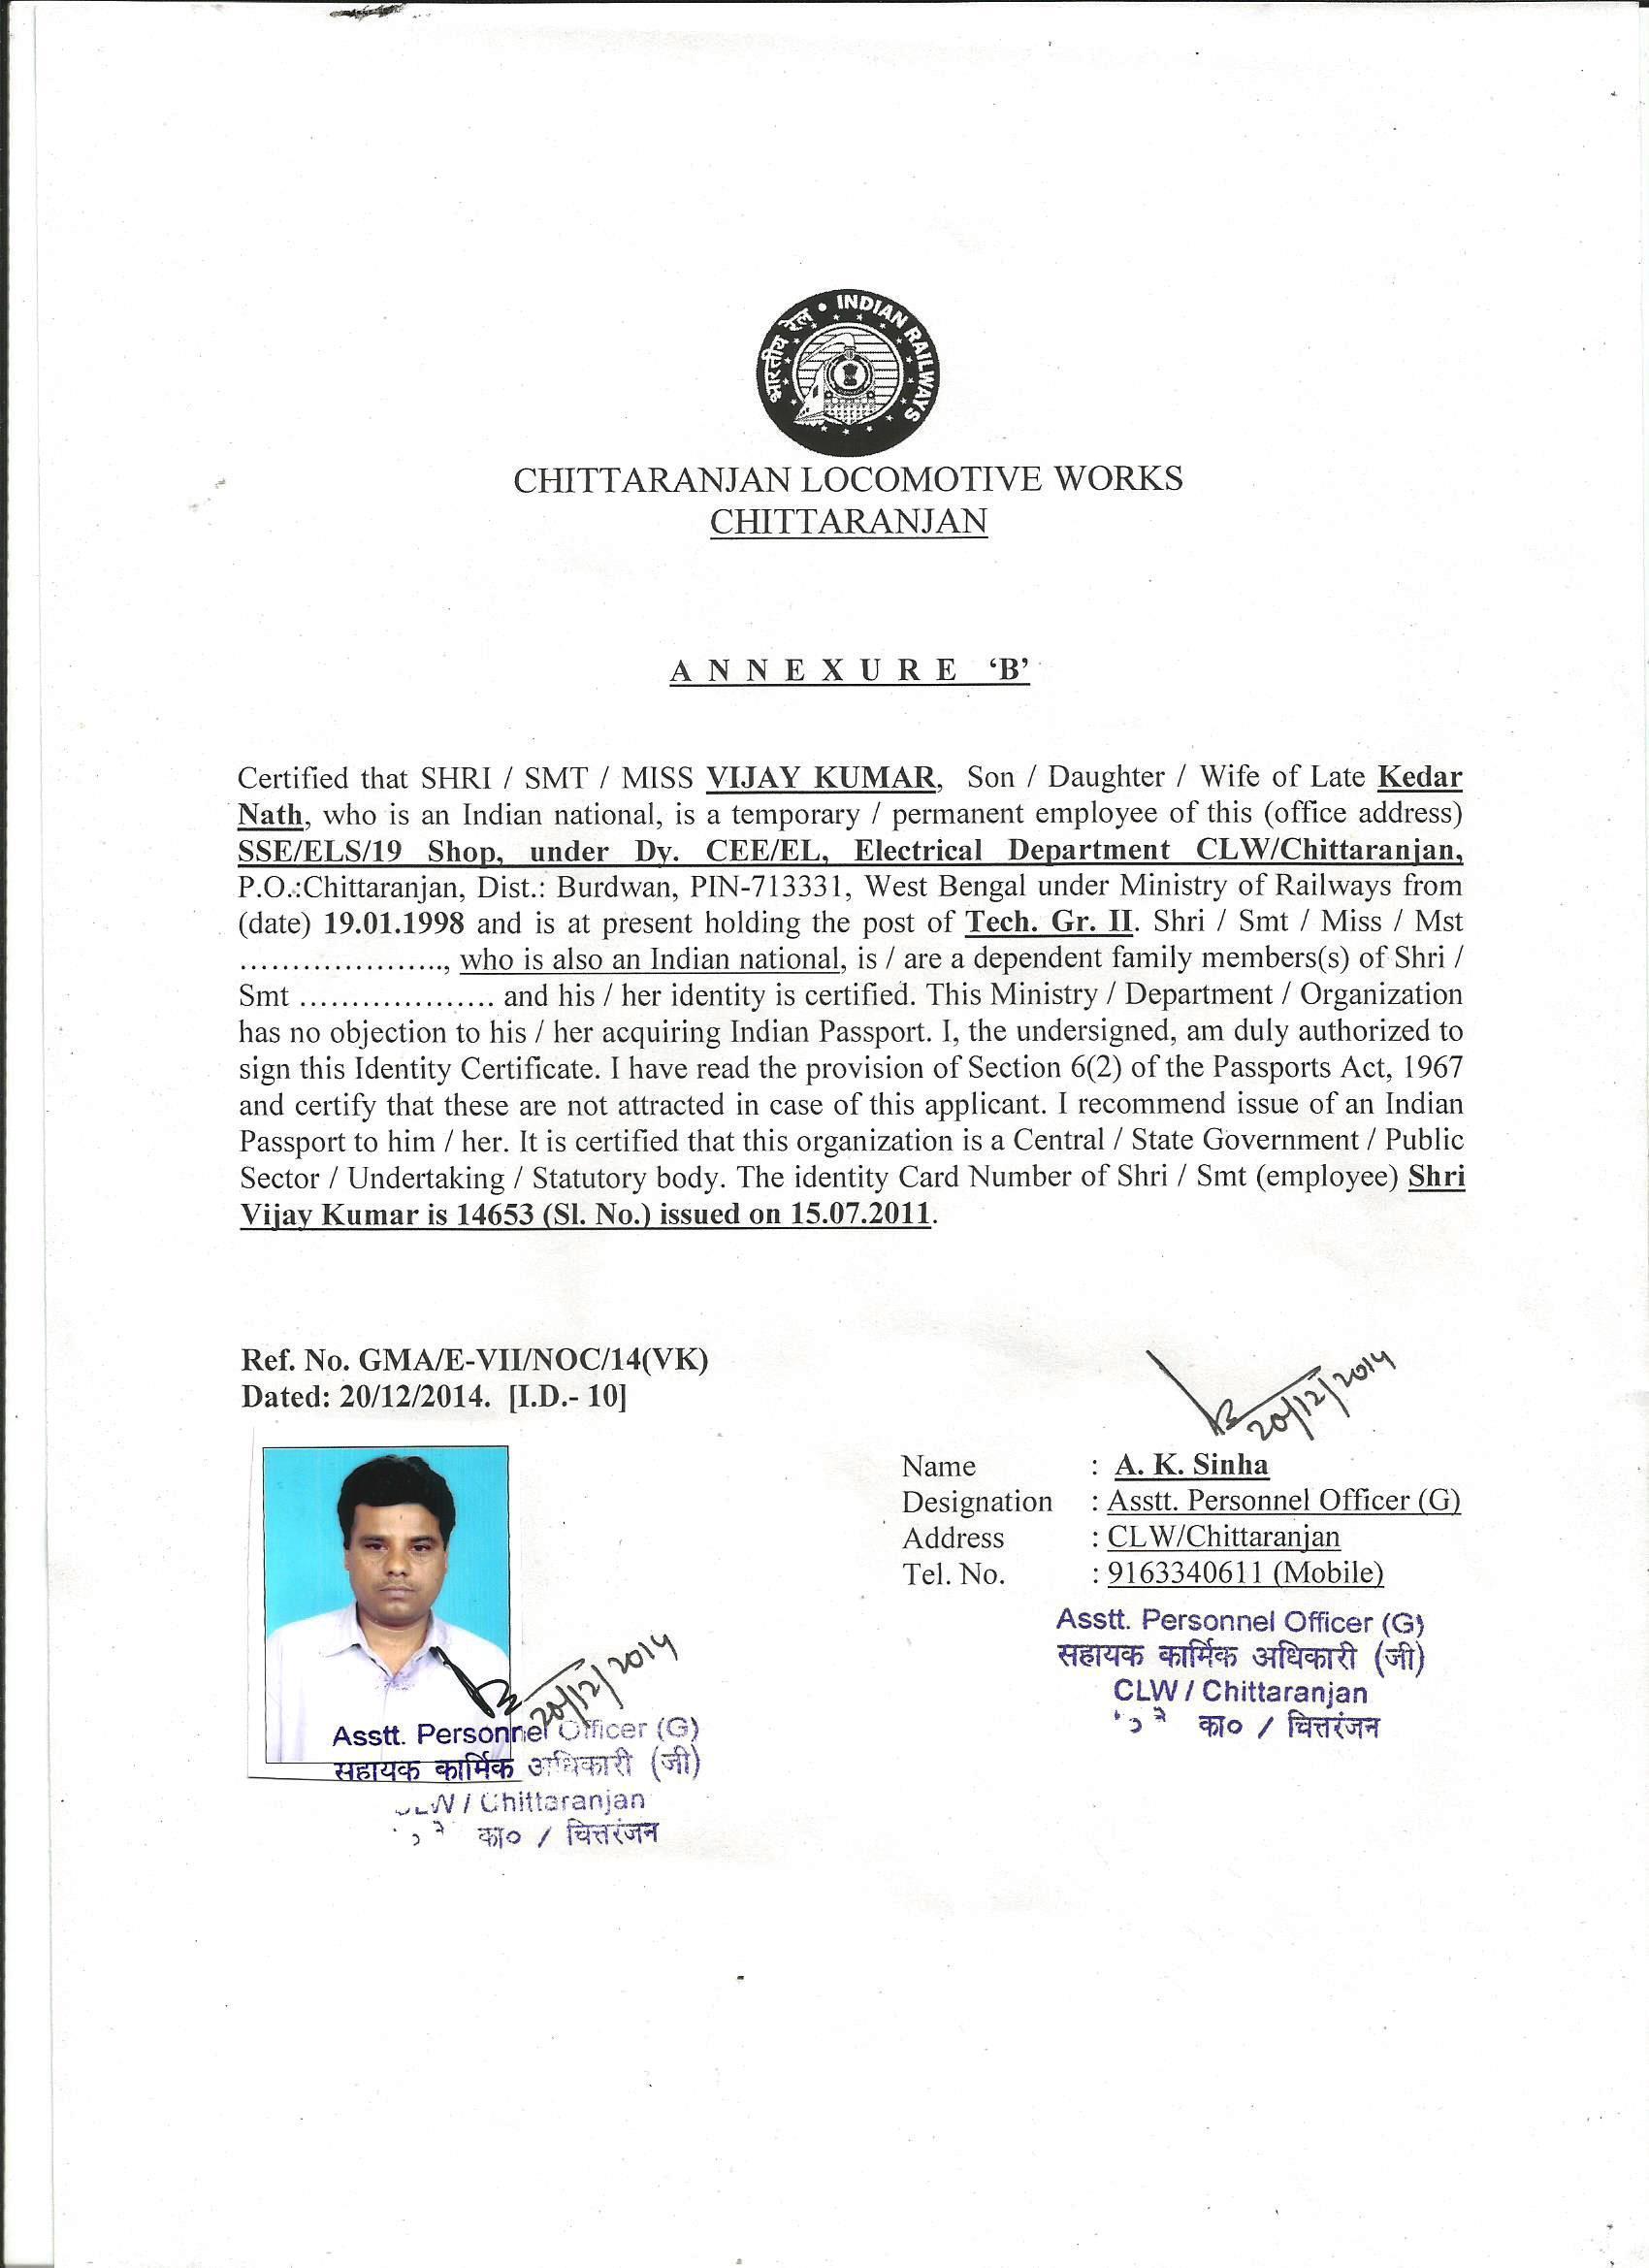 shri vijay kumar technician grii under sseels 19